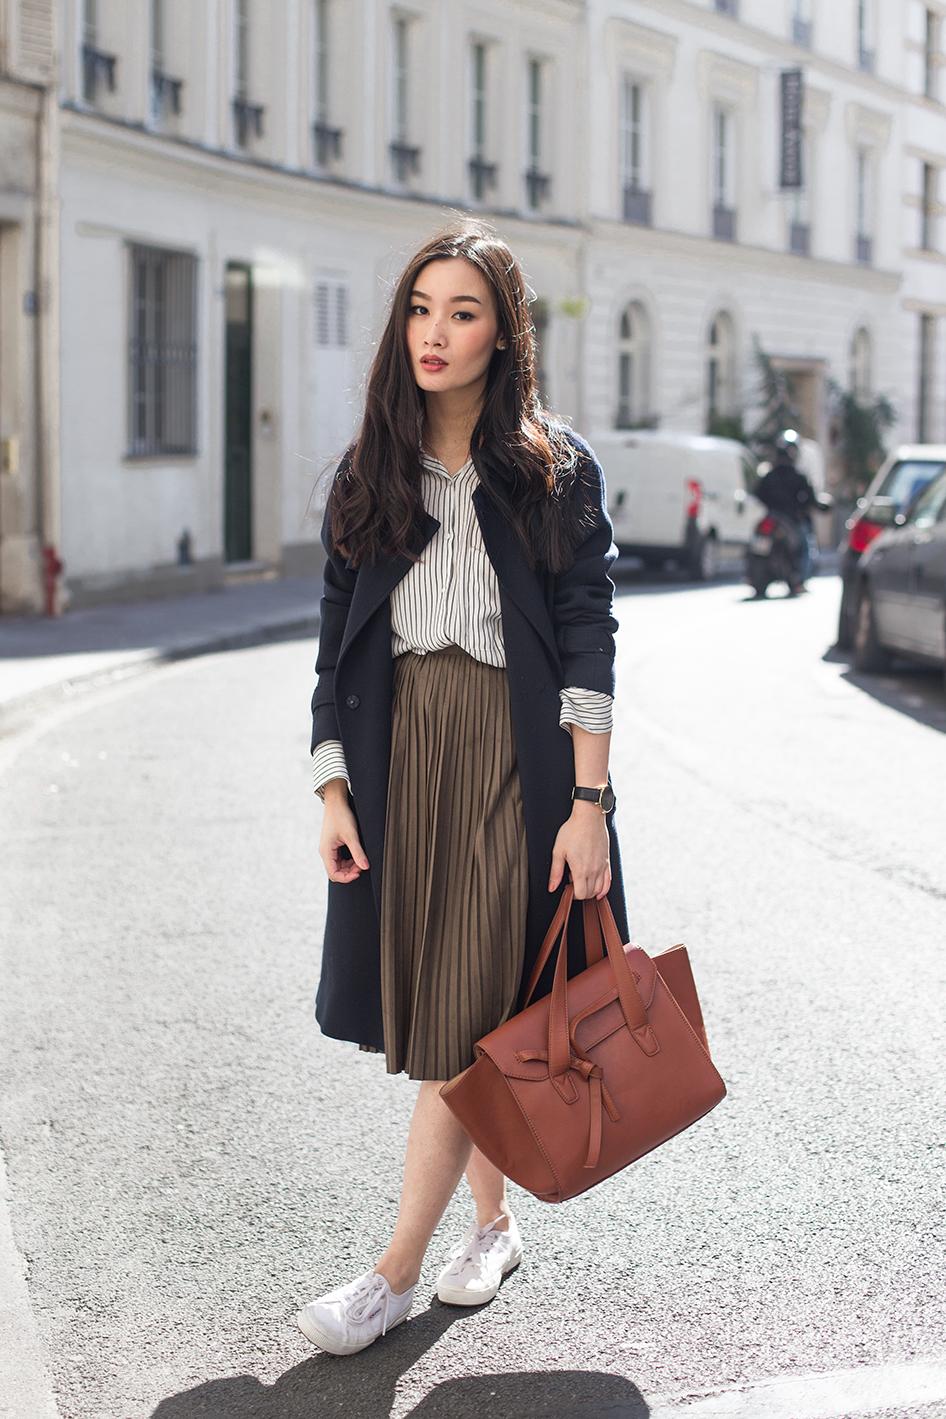 tinique.com+-+amsterdam+-+minimal+style+